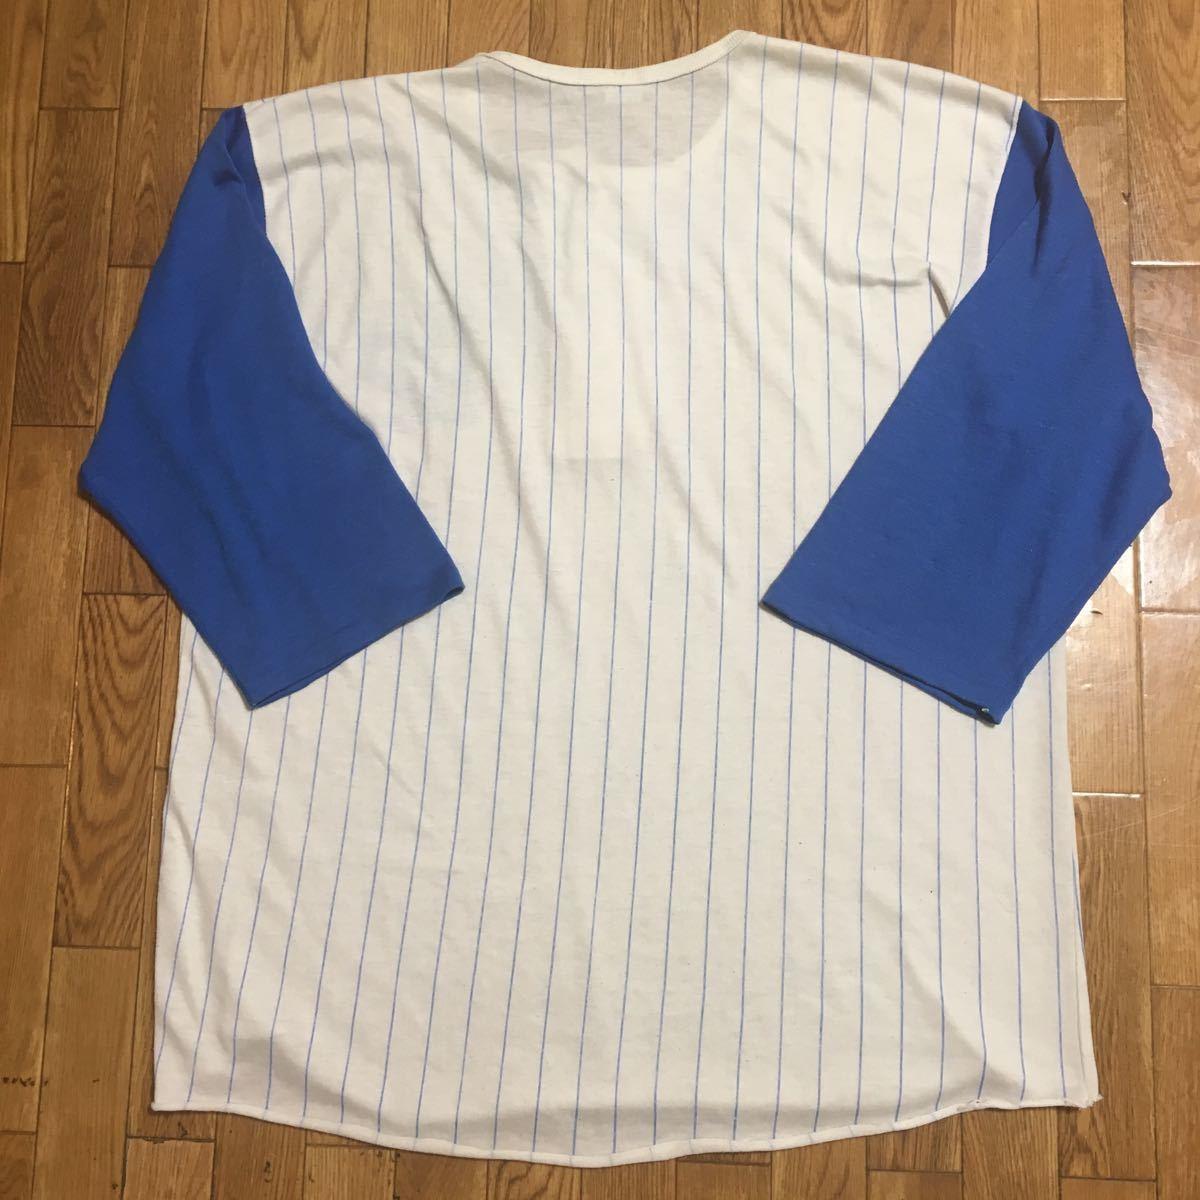 80s USA製 ARTEX ヘンリーネックシャツ 七分袖 青 白 ストライプ サイズ不明 実寸XLサイズ 古着 ヴィンテージ ナンバリング ベースボール_画像6